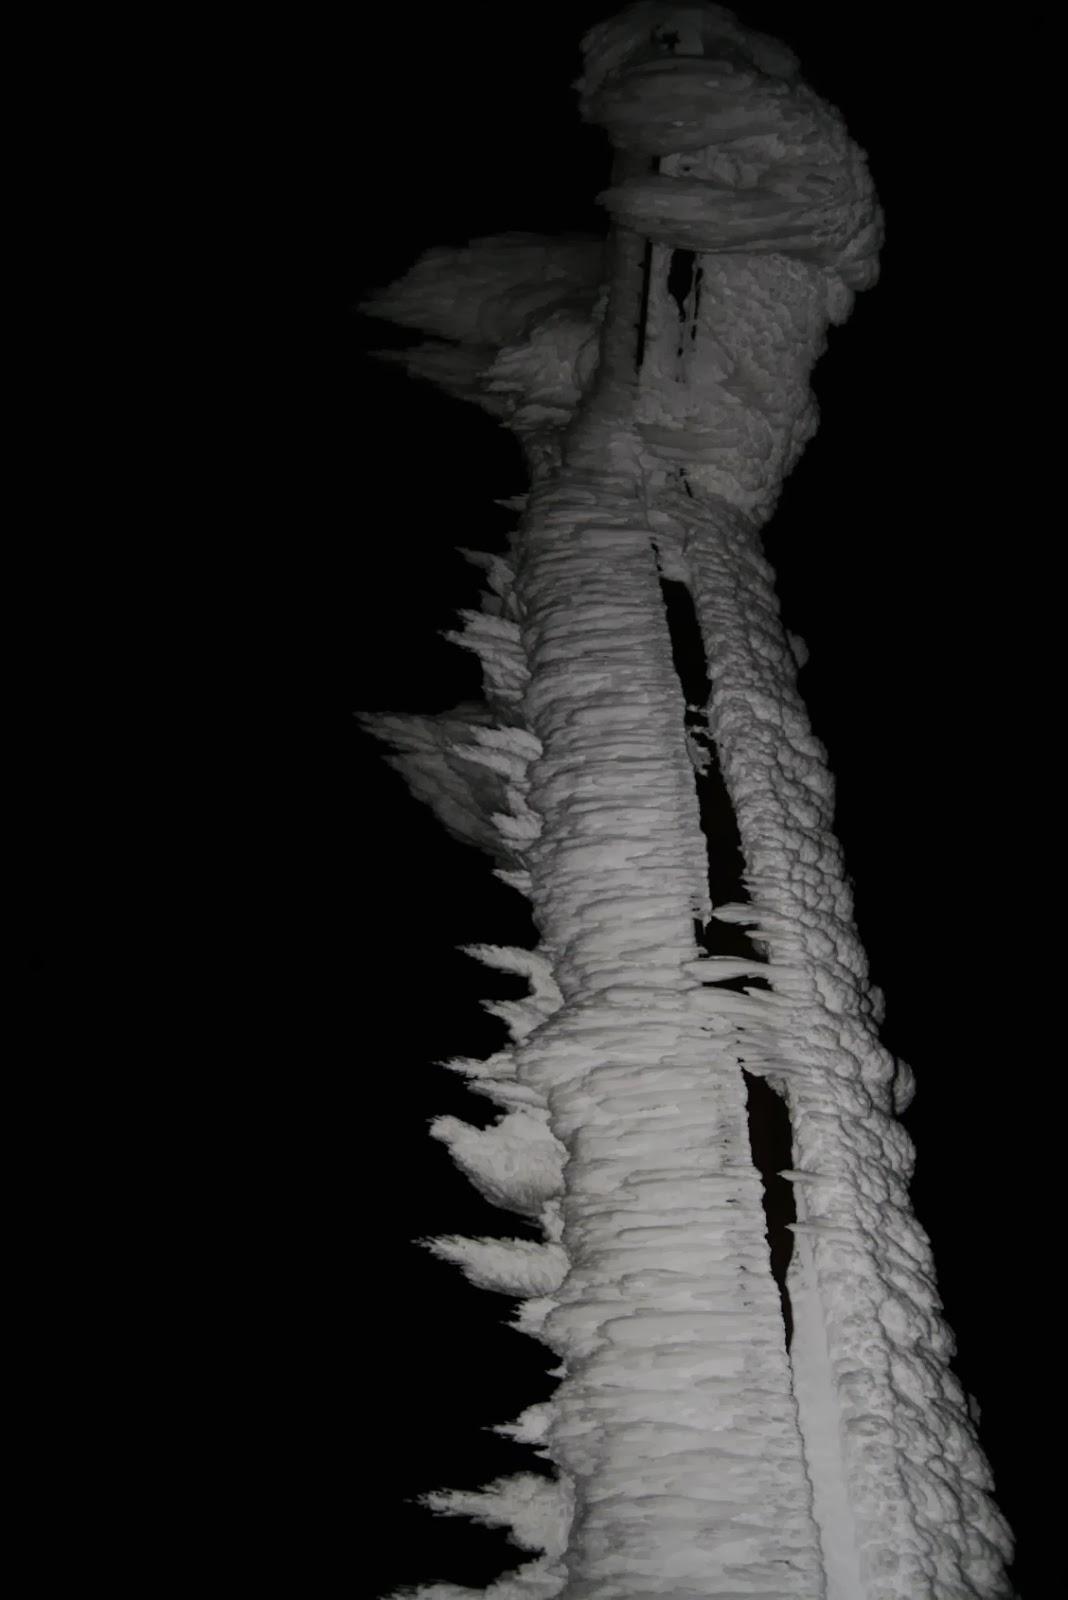 Montagnatore Bianco E Nero Avventura Notturna Su Neve Fresca A